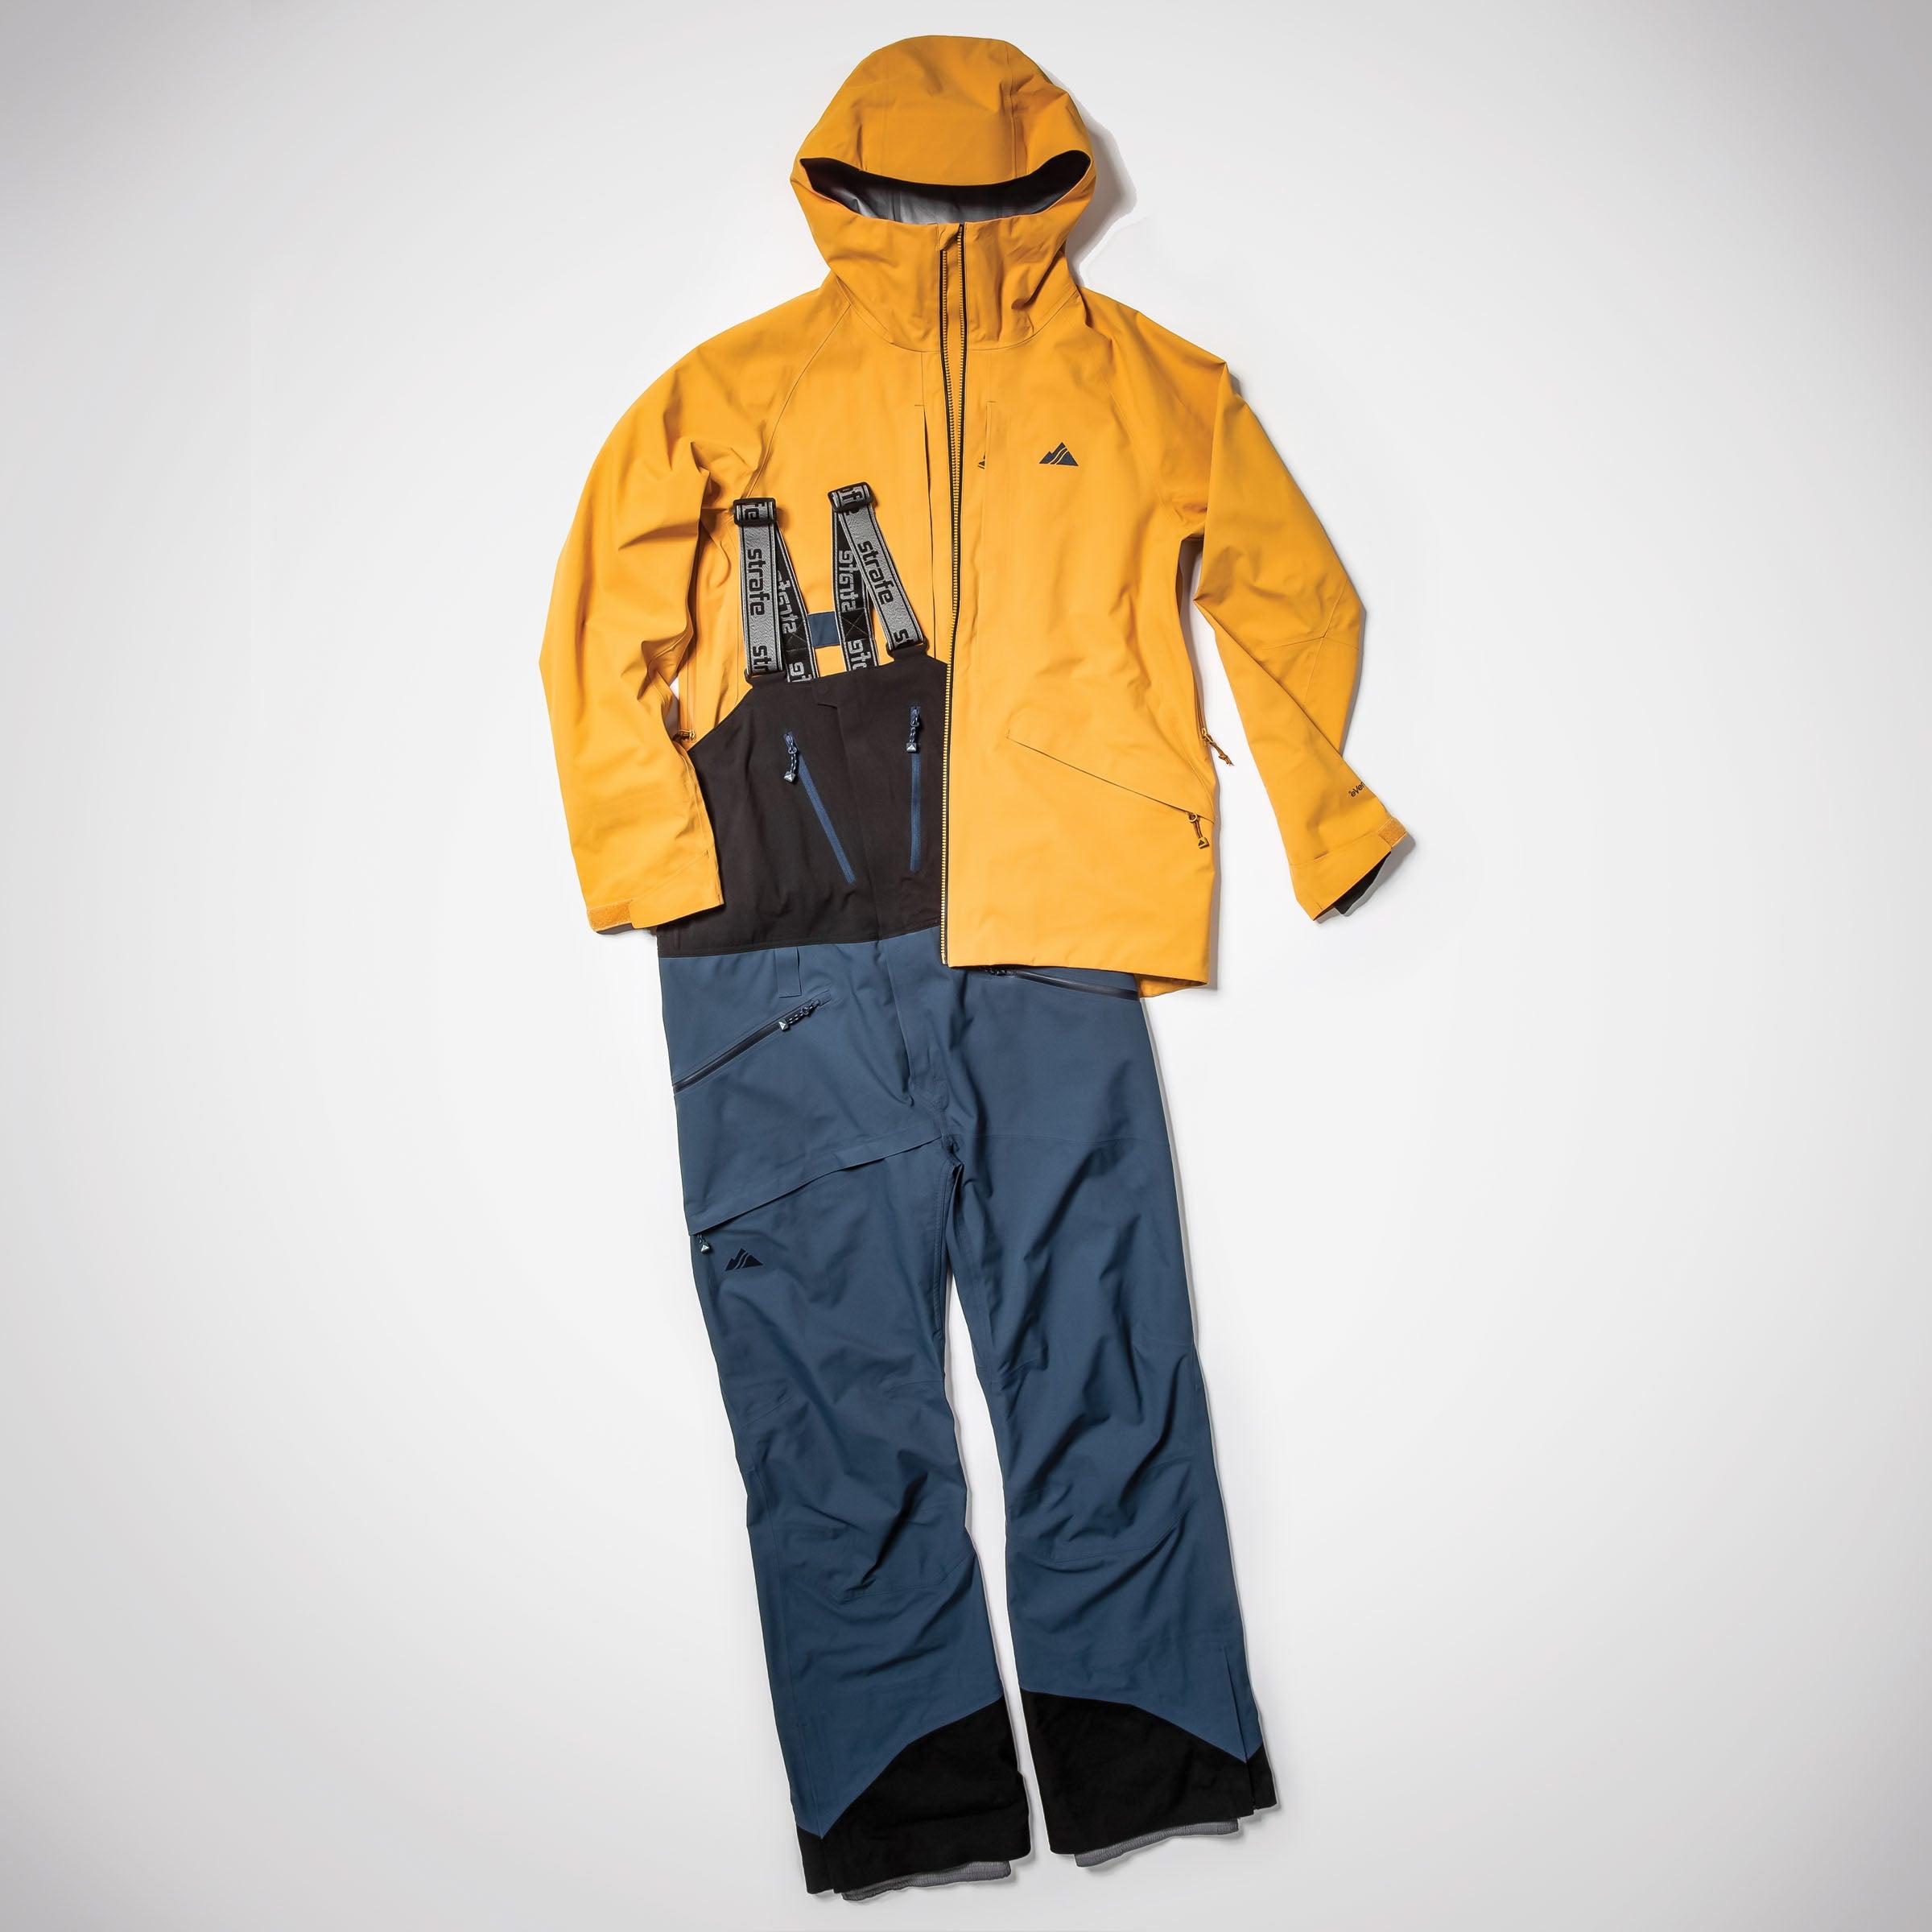 Strafe Nomad Jacket and Bib